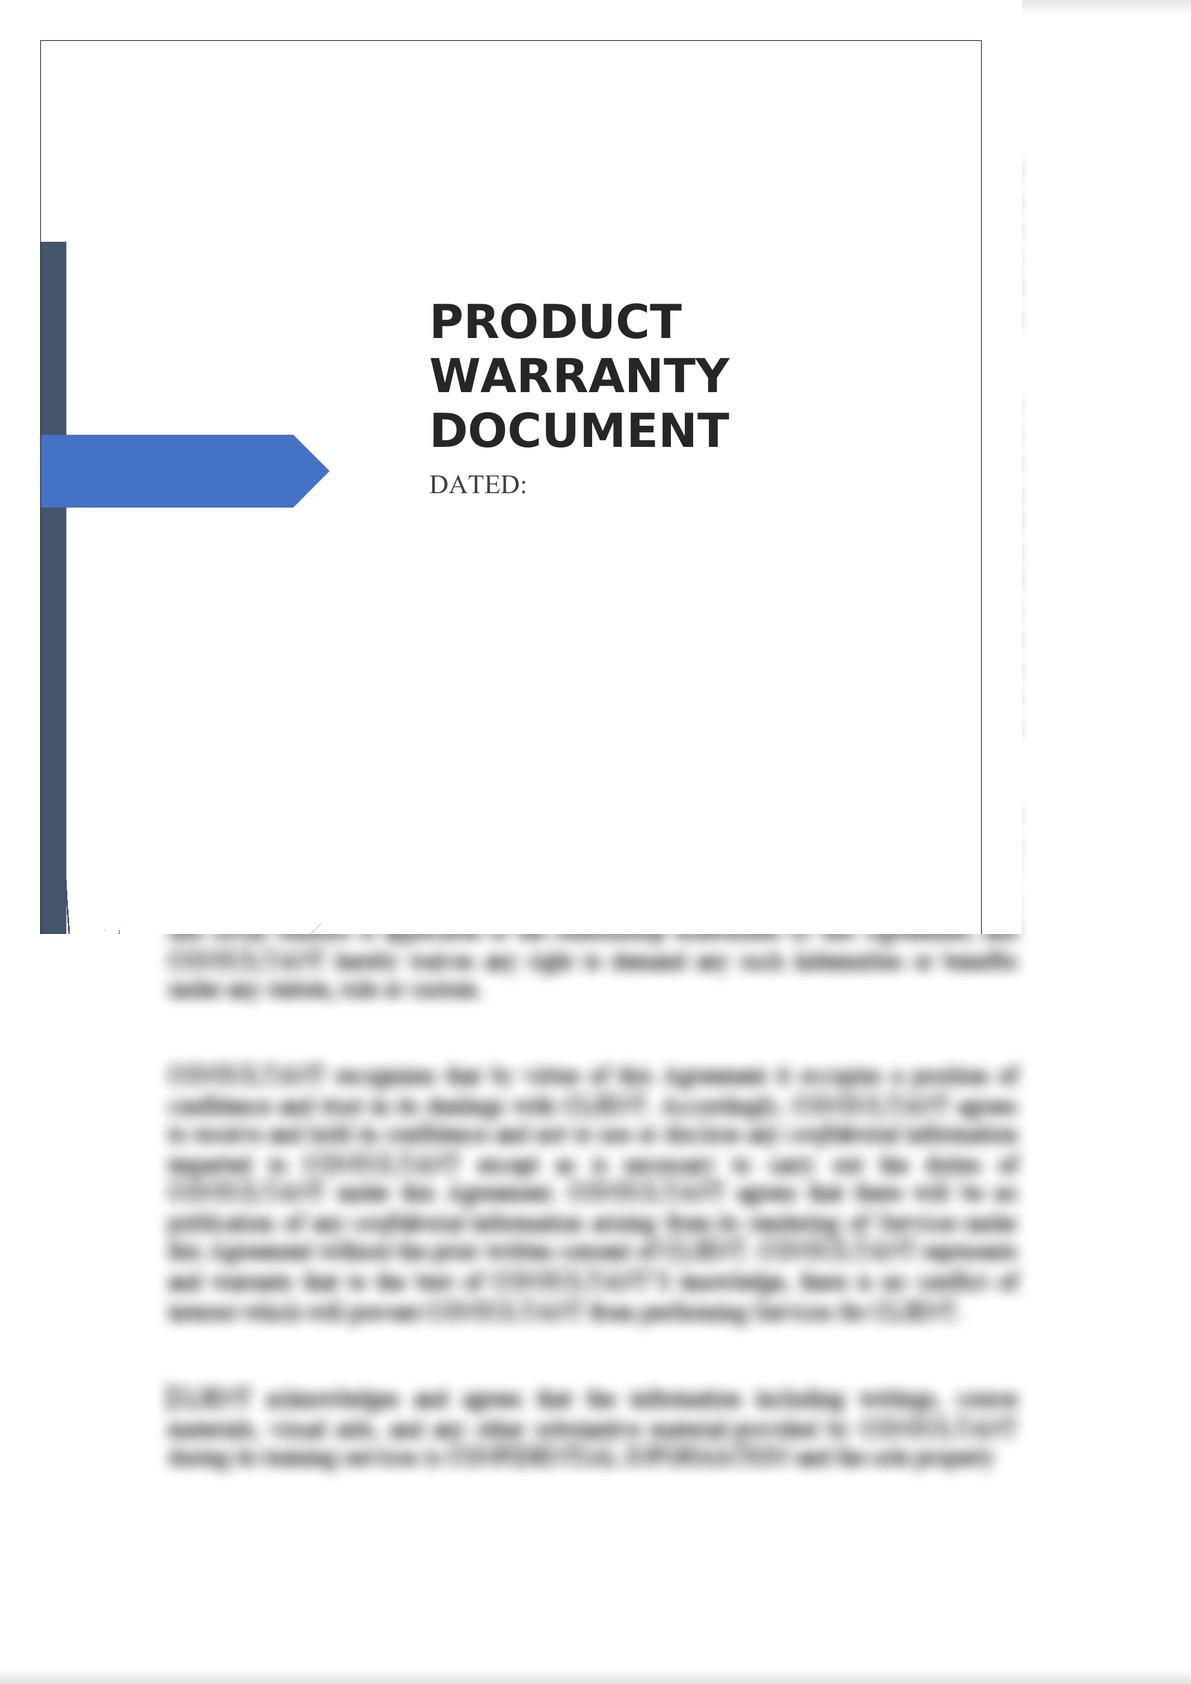 Product Warranty Document-0